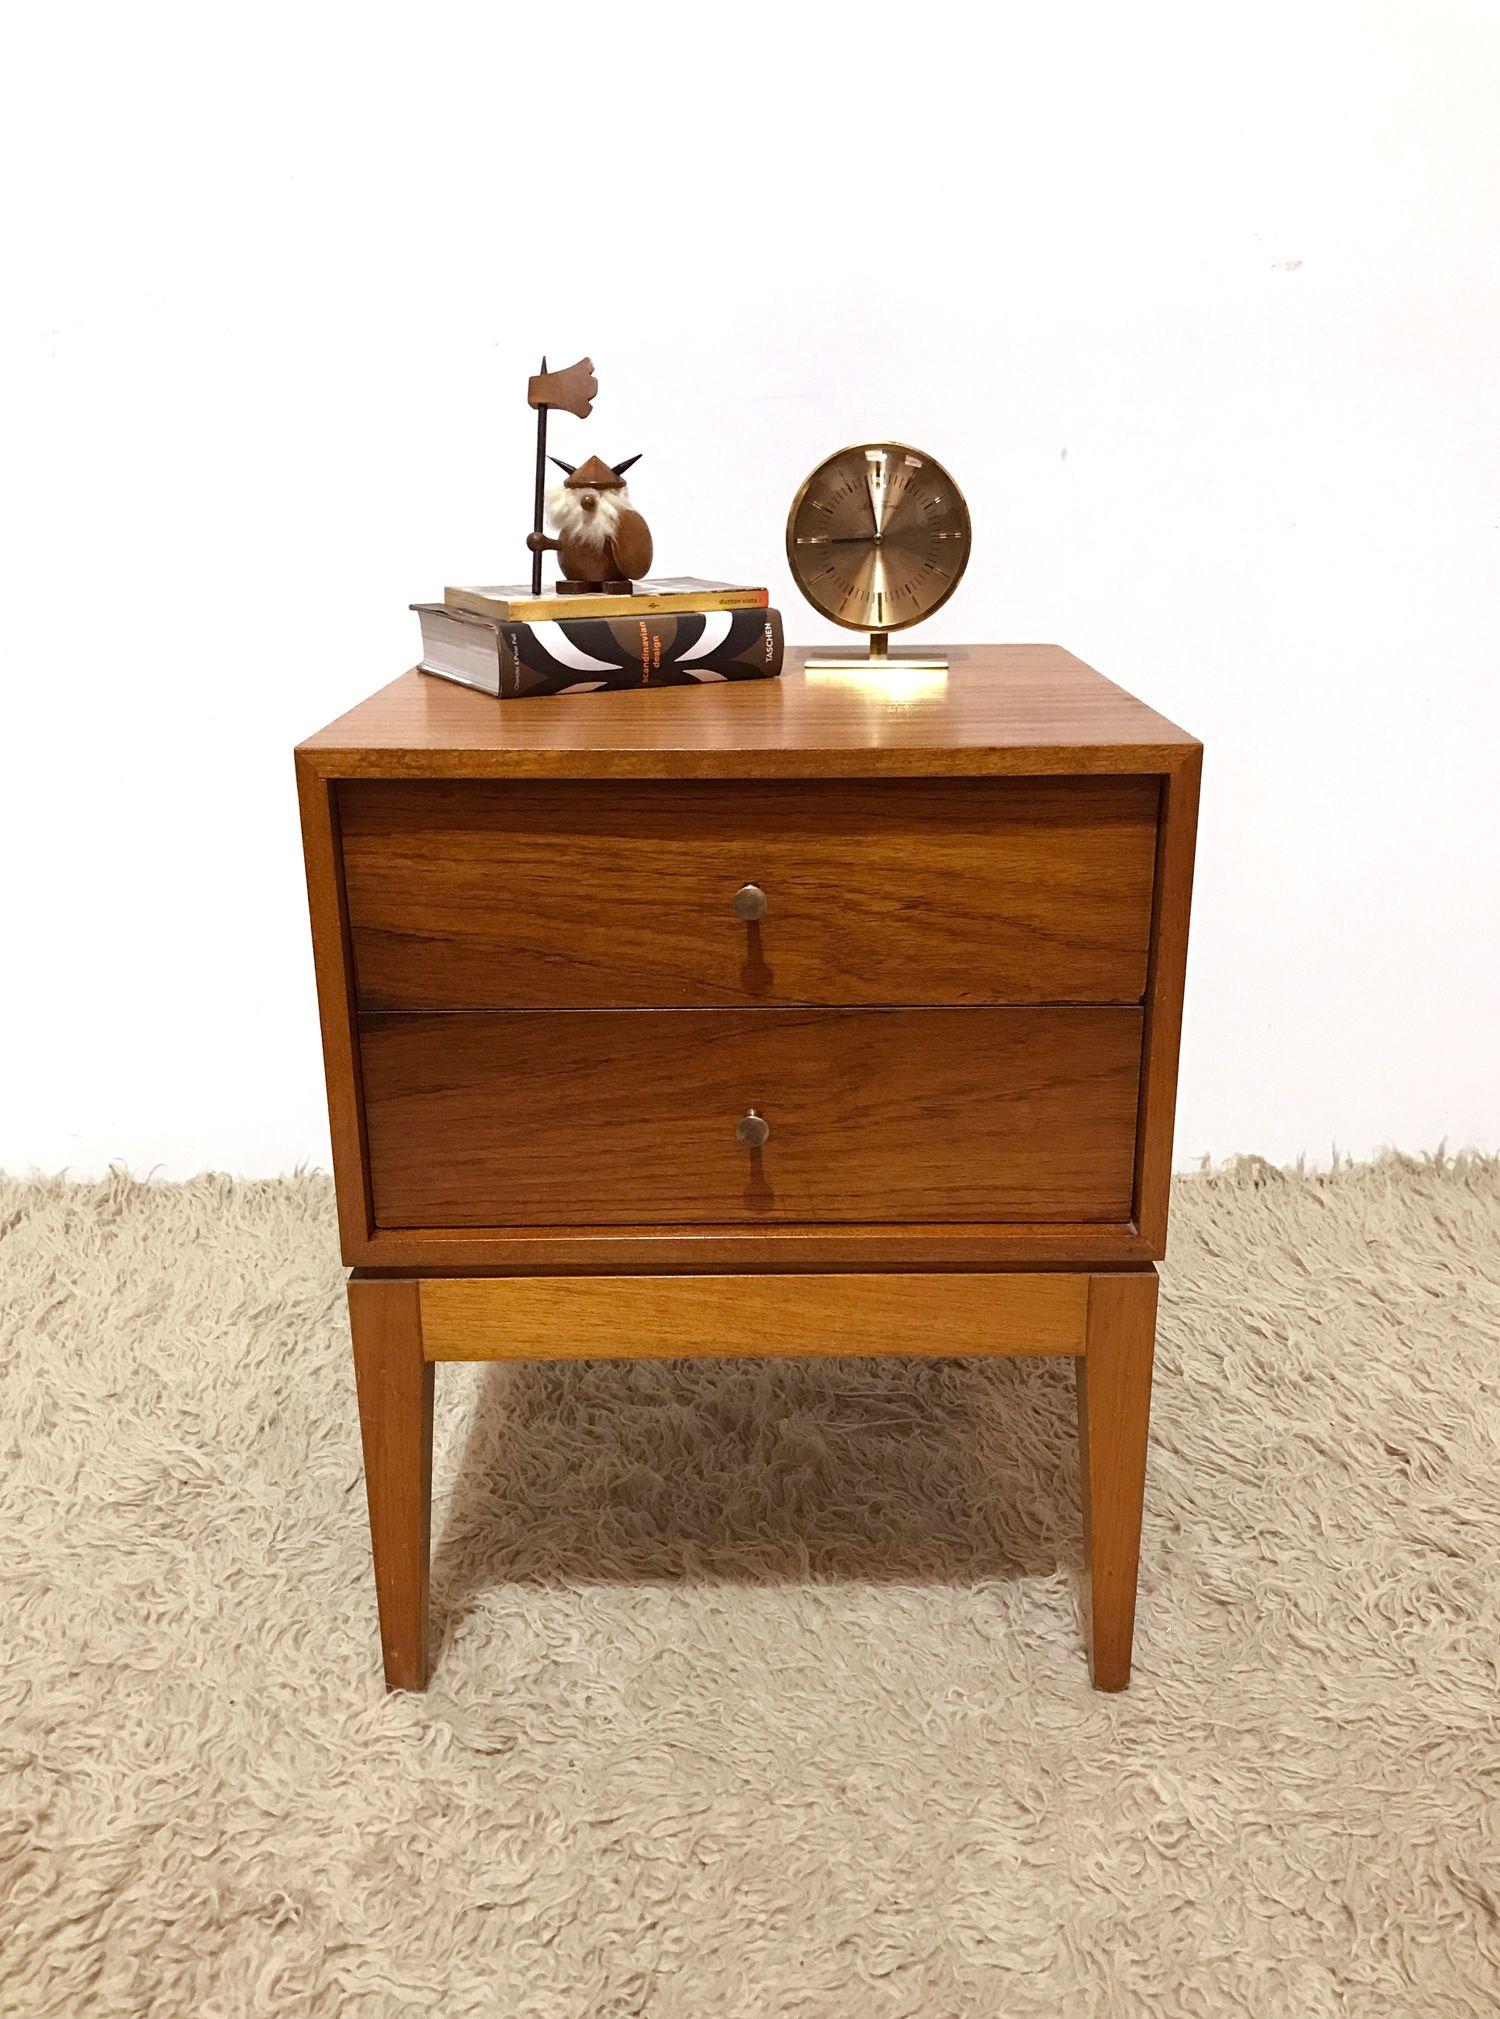 60s Vintage Mid Century Walnut Uniflex Bedside Table Chest